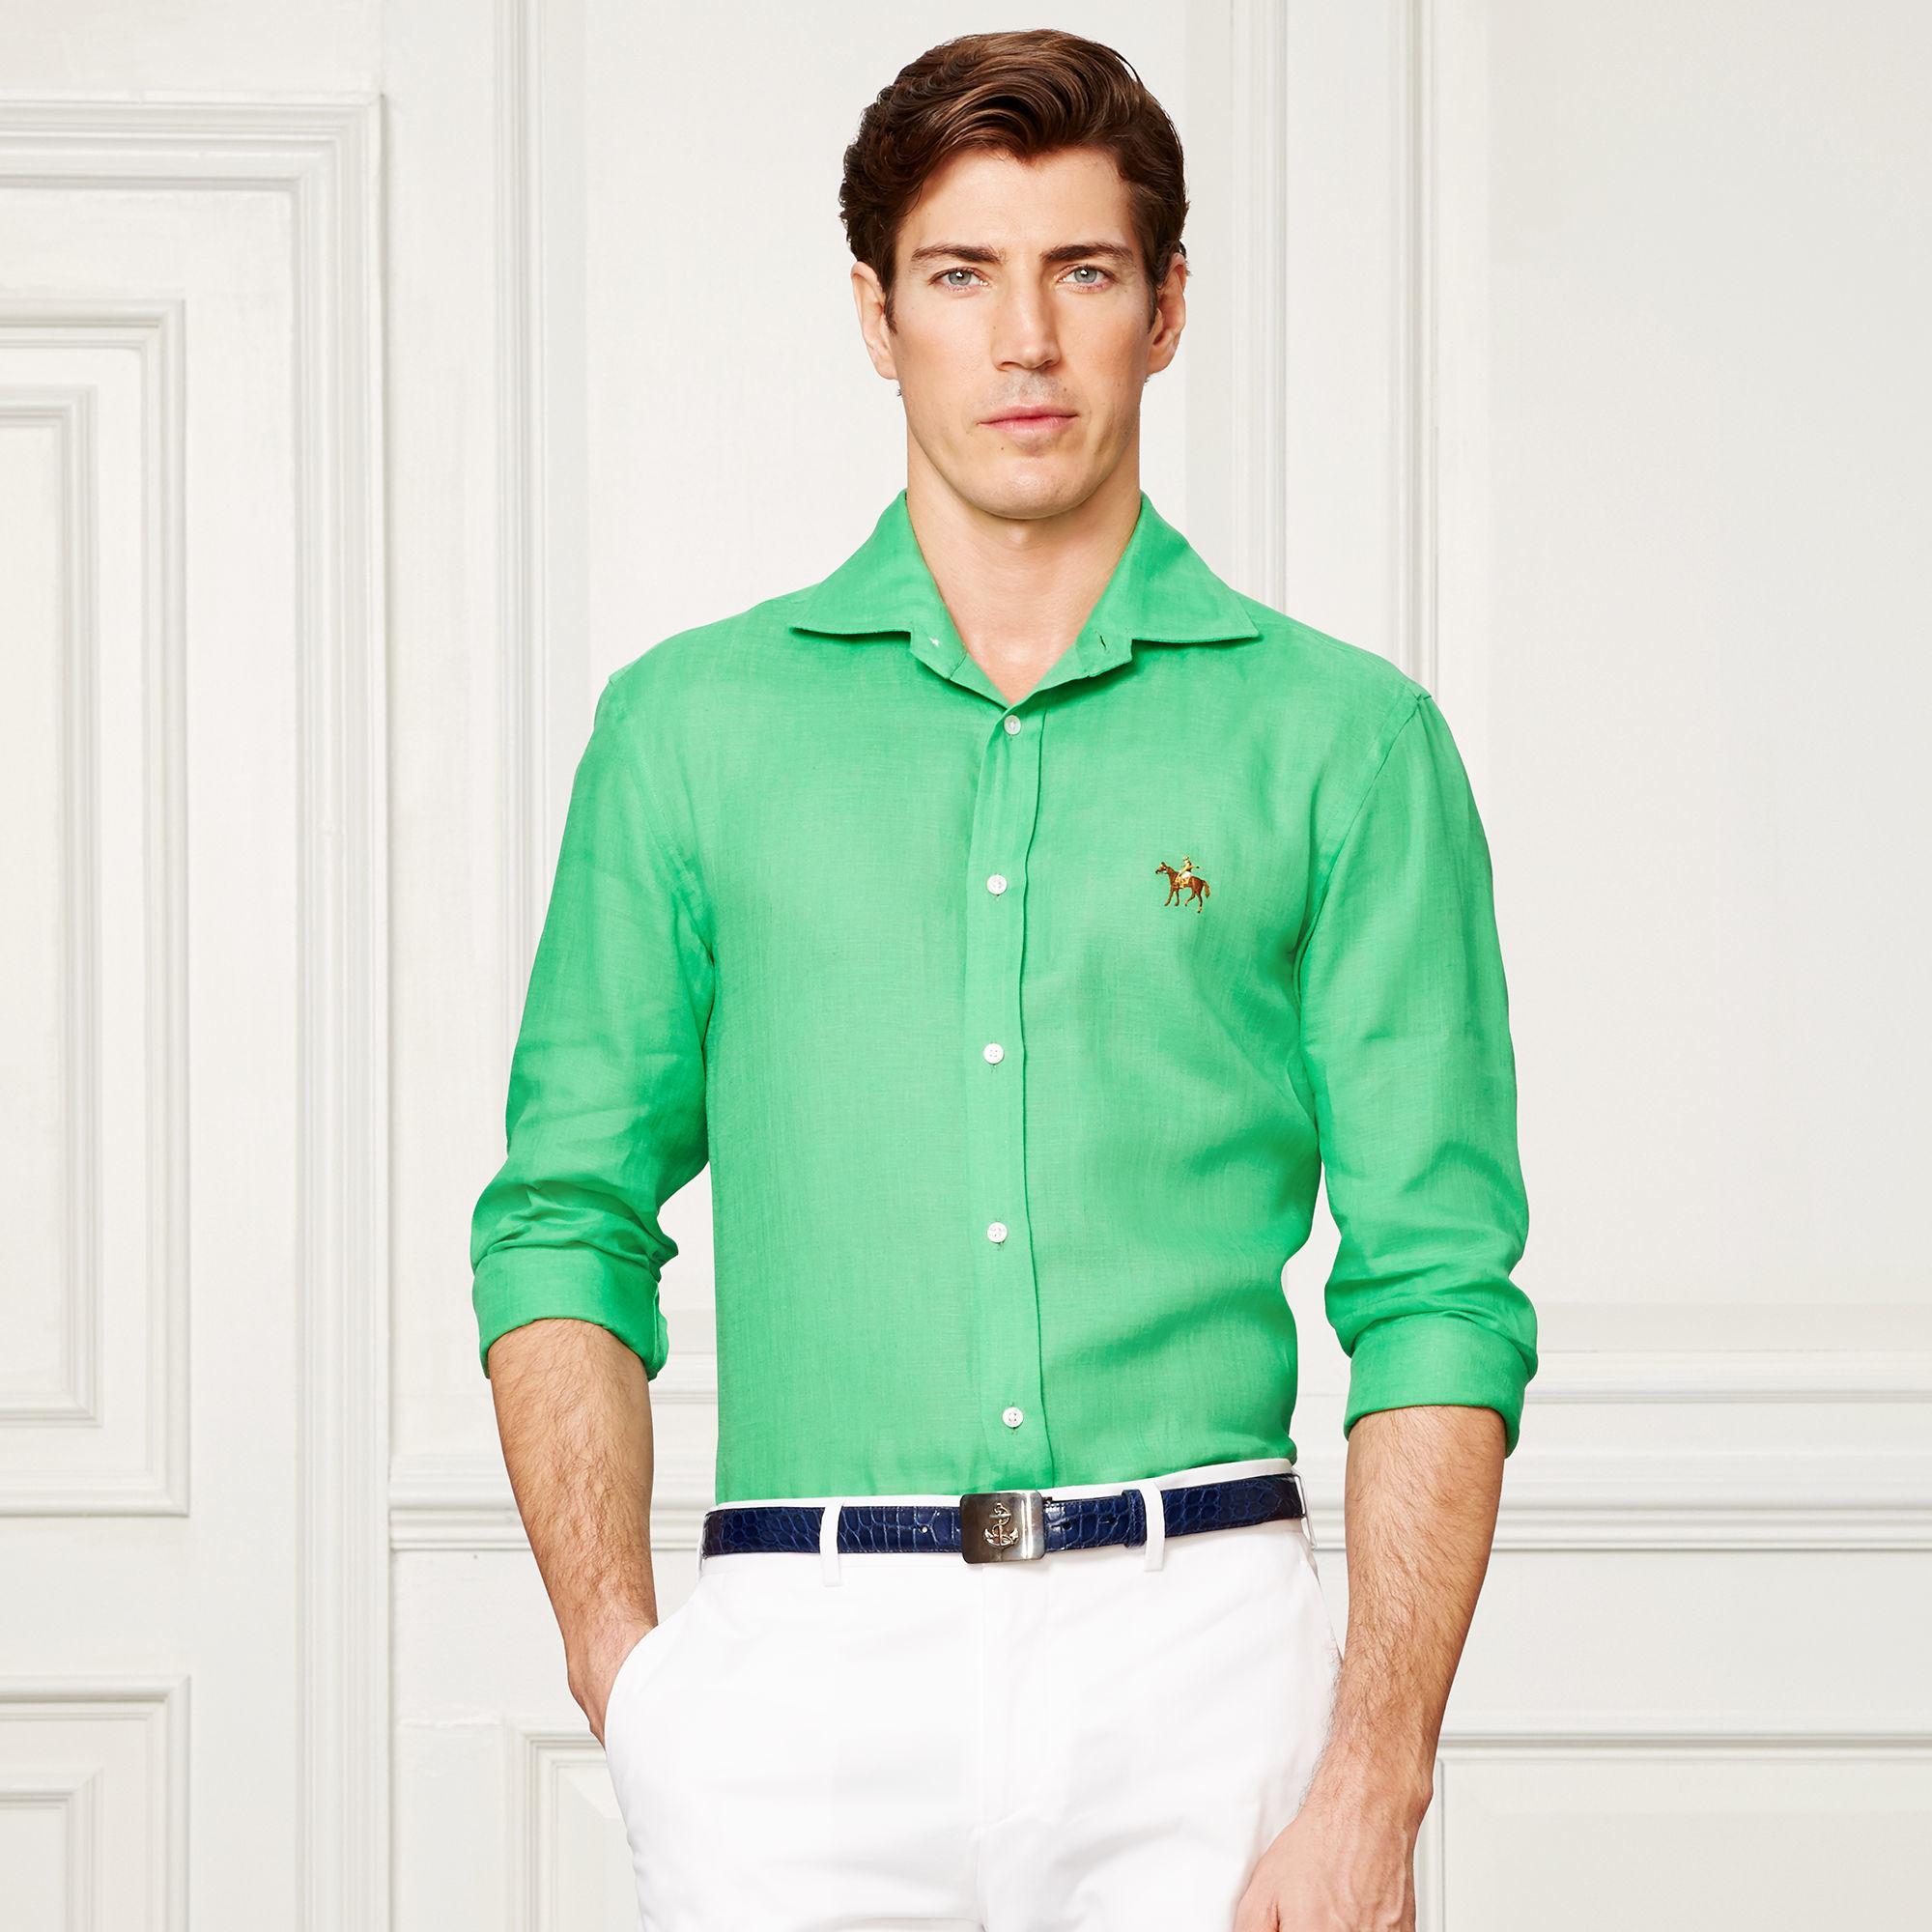 Lyst - Ralph Lauren Purple Label Aston Linen Sport Shirt in Green for Men